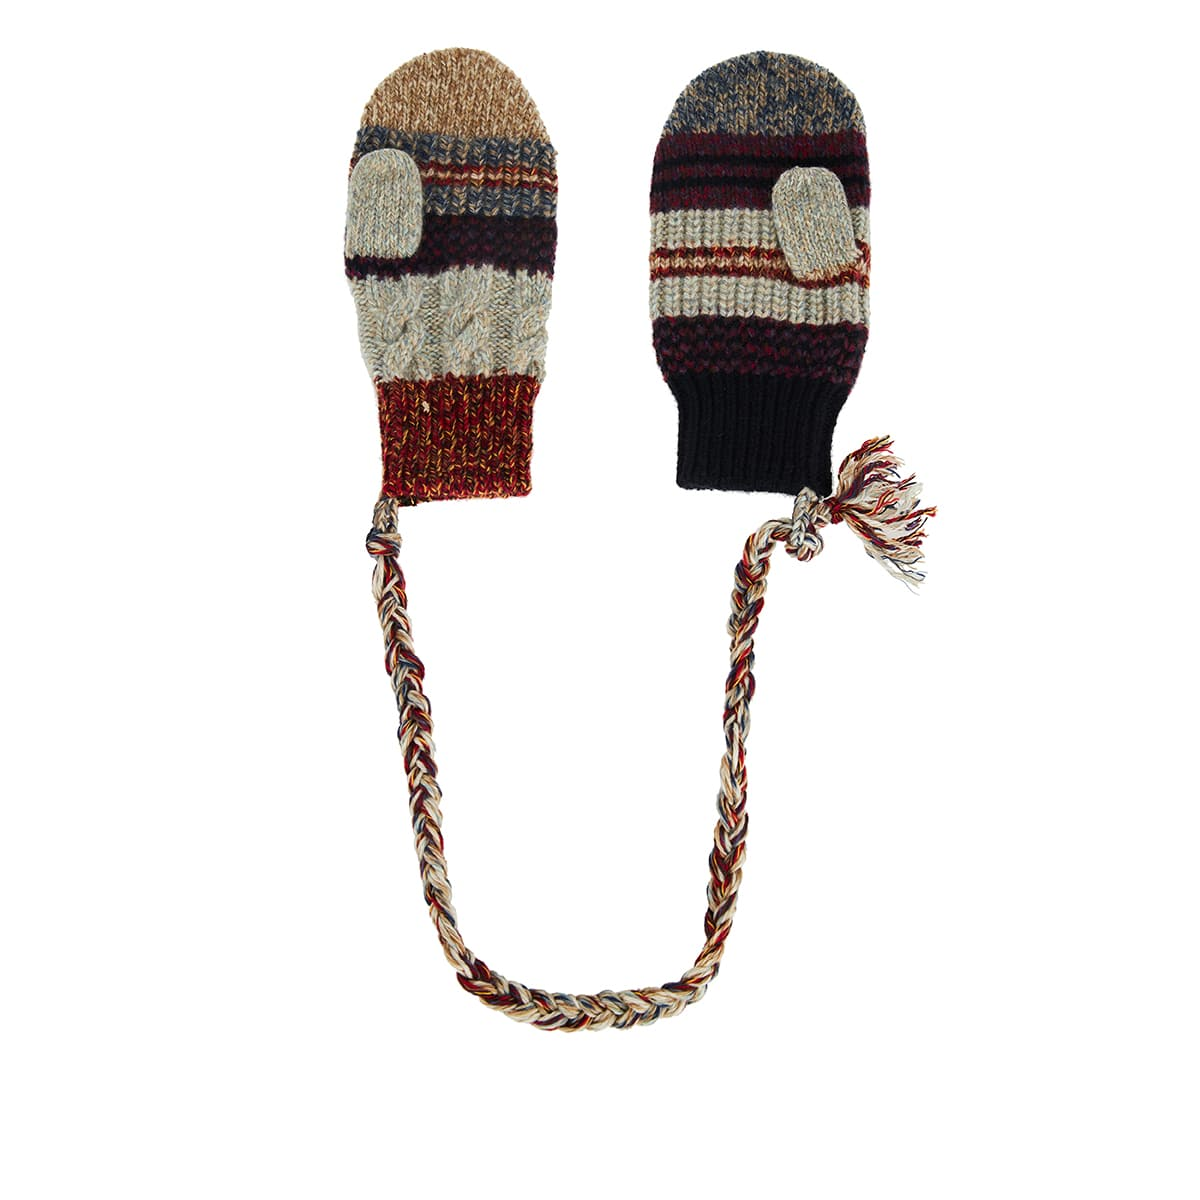 x Federico Curradi Timor wool gloves